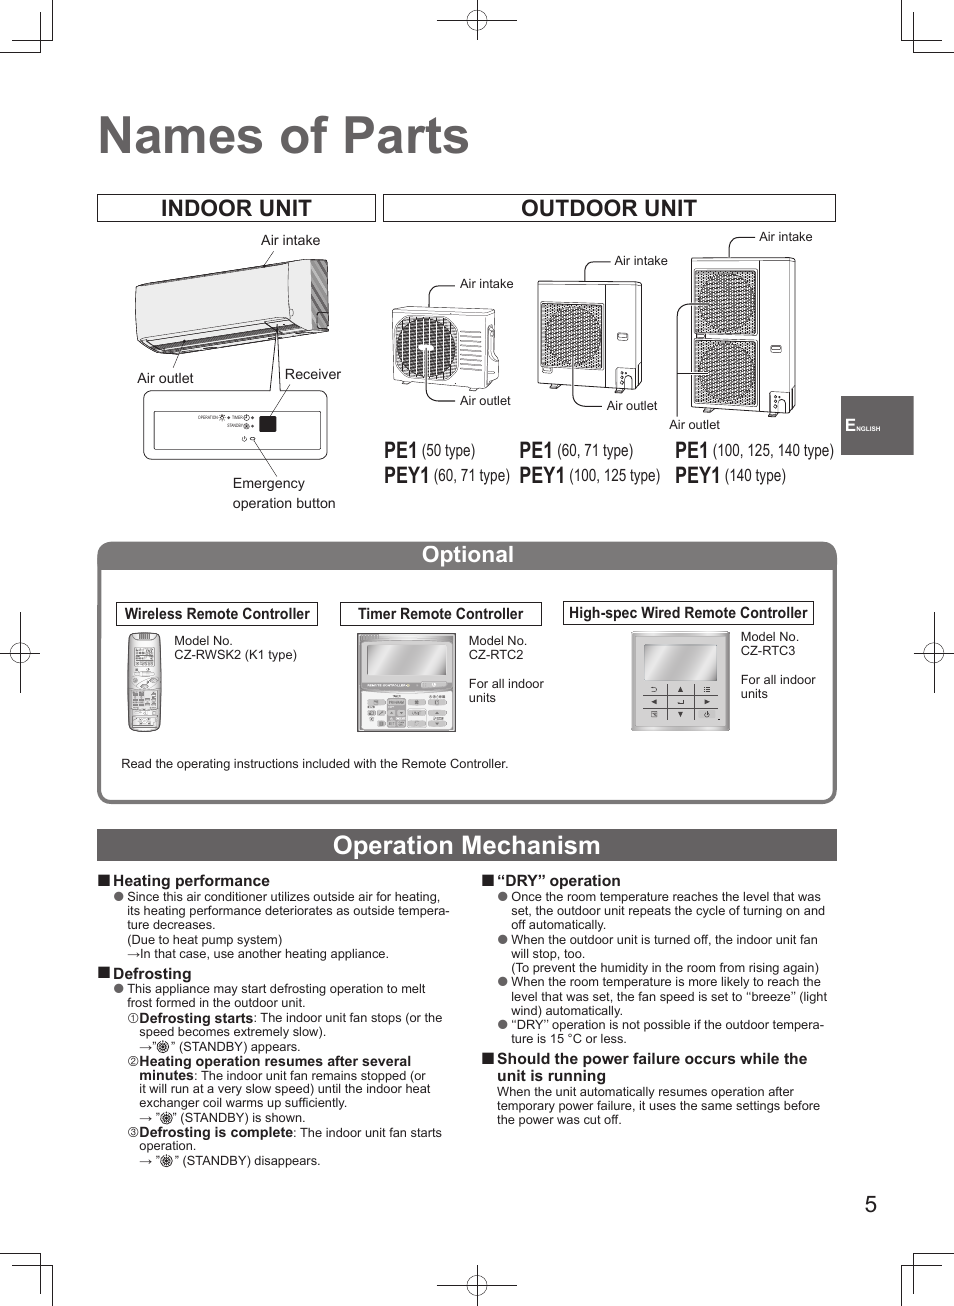 names of parts operation mechanism indoor unit outdoor unit rh manualsdir com panasonic ne1856 parts manual panasonic ne1856 parts manual